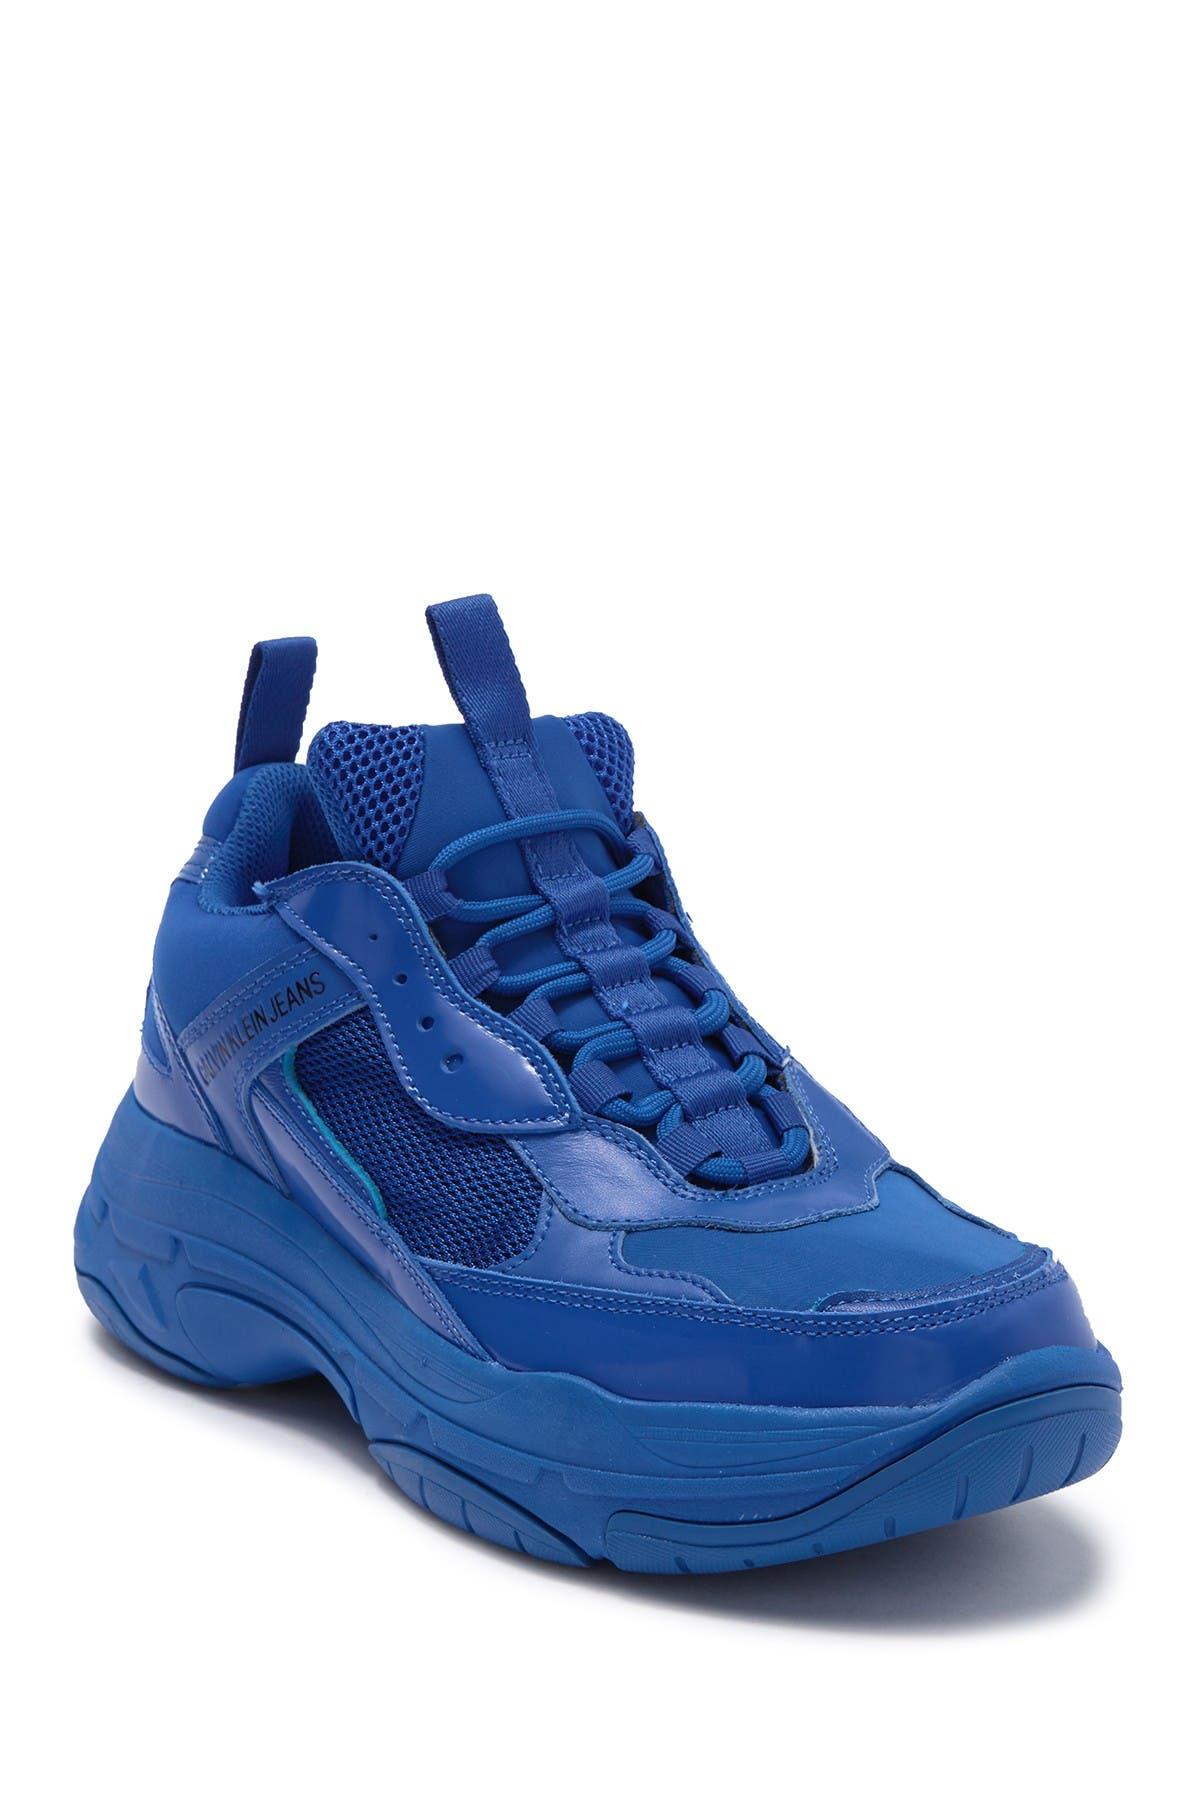 Calvin Klein Jeans | Marvin Sneaker